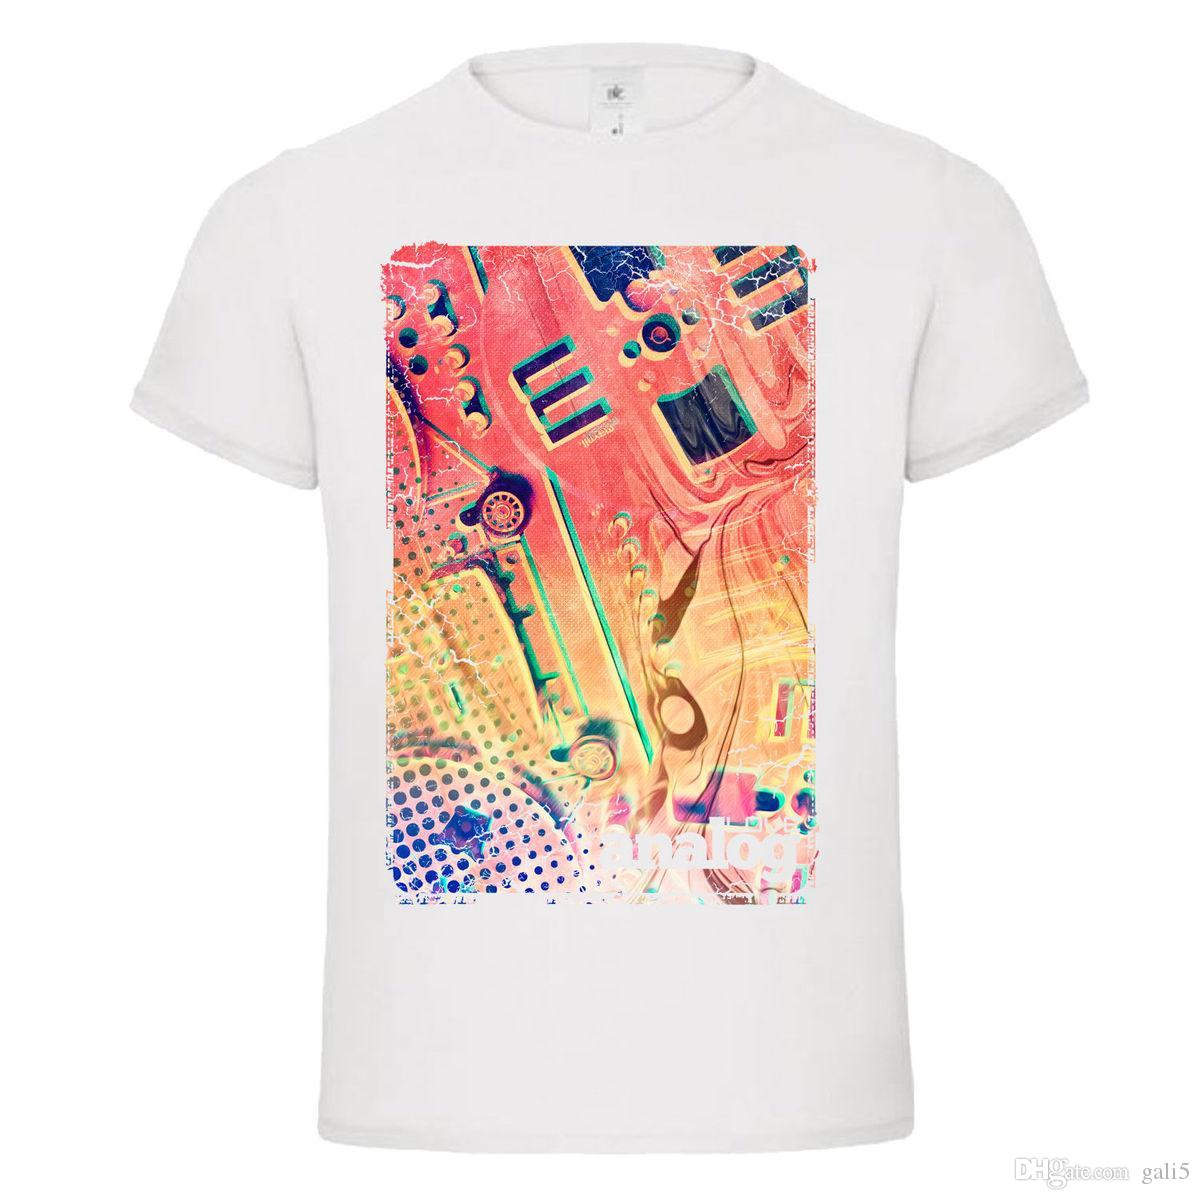 a724ea038 I Love The 80s T Shirt Size 20 | Azərbaycan Dillər Universiteti